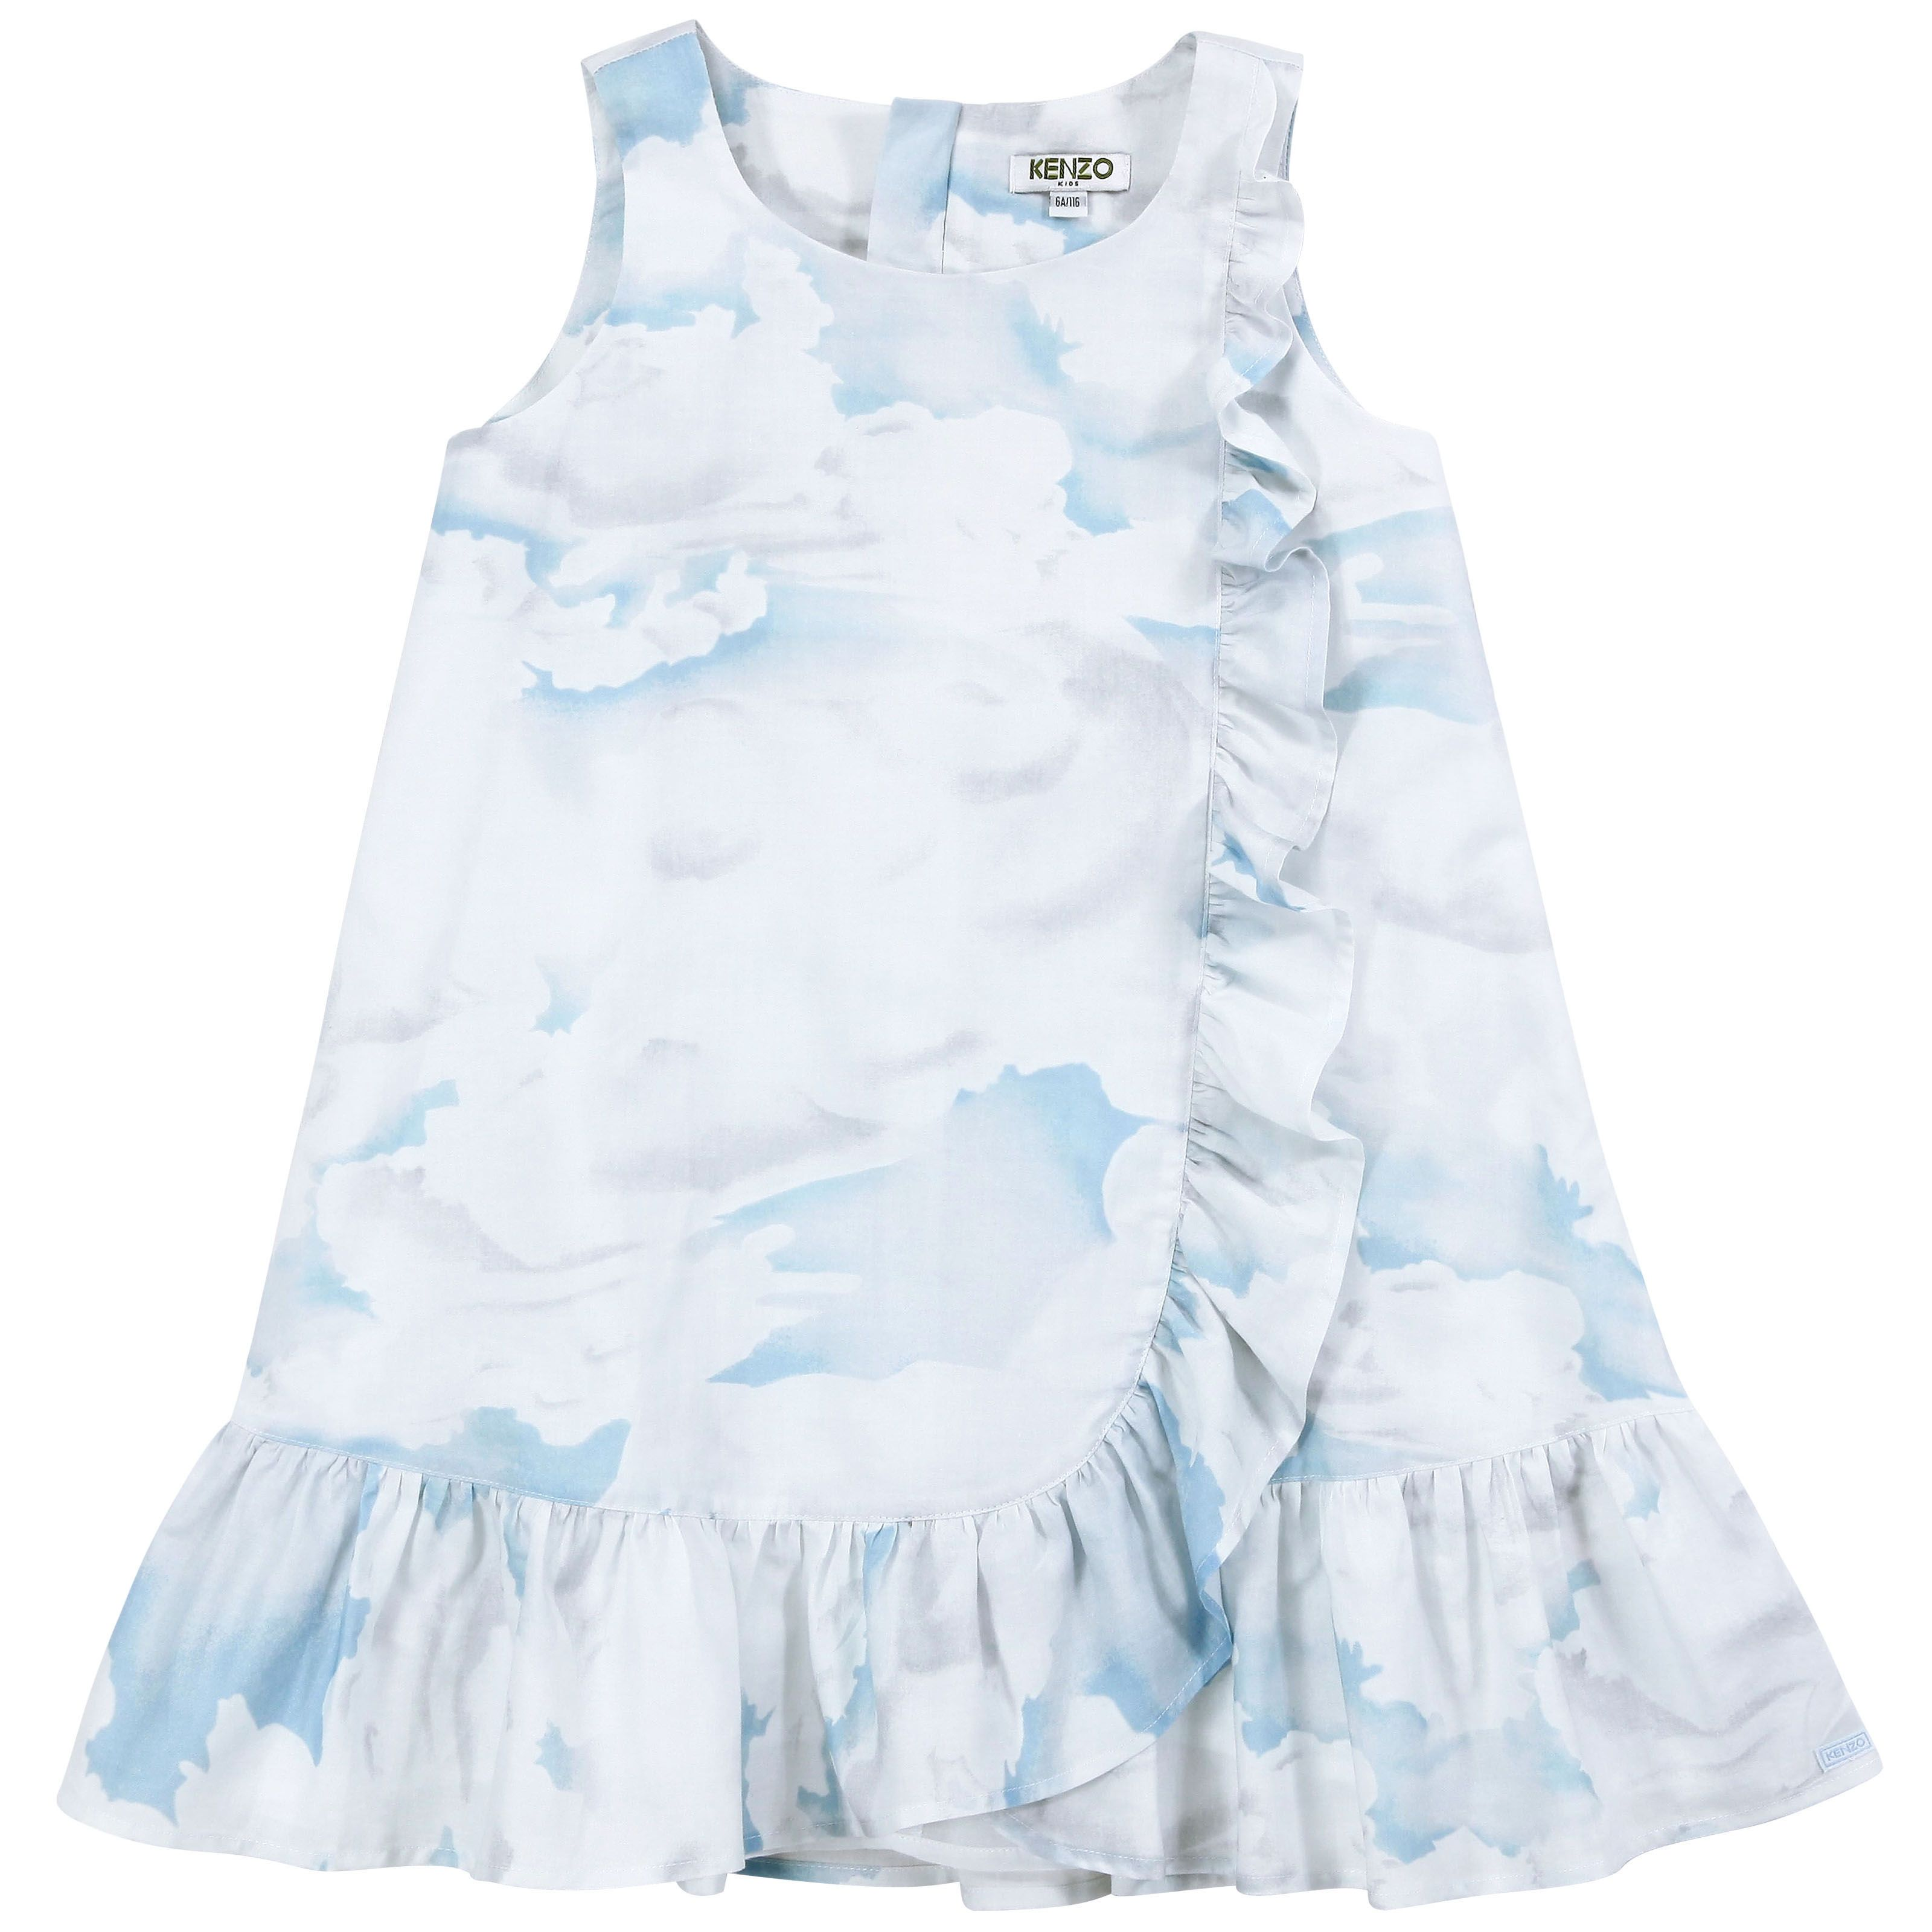 Mini me clouds printed dress from Kenzo Kids 96 00 €